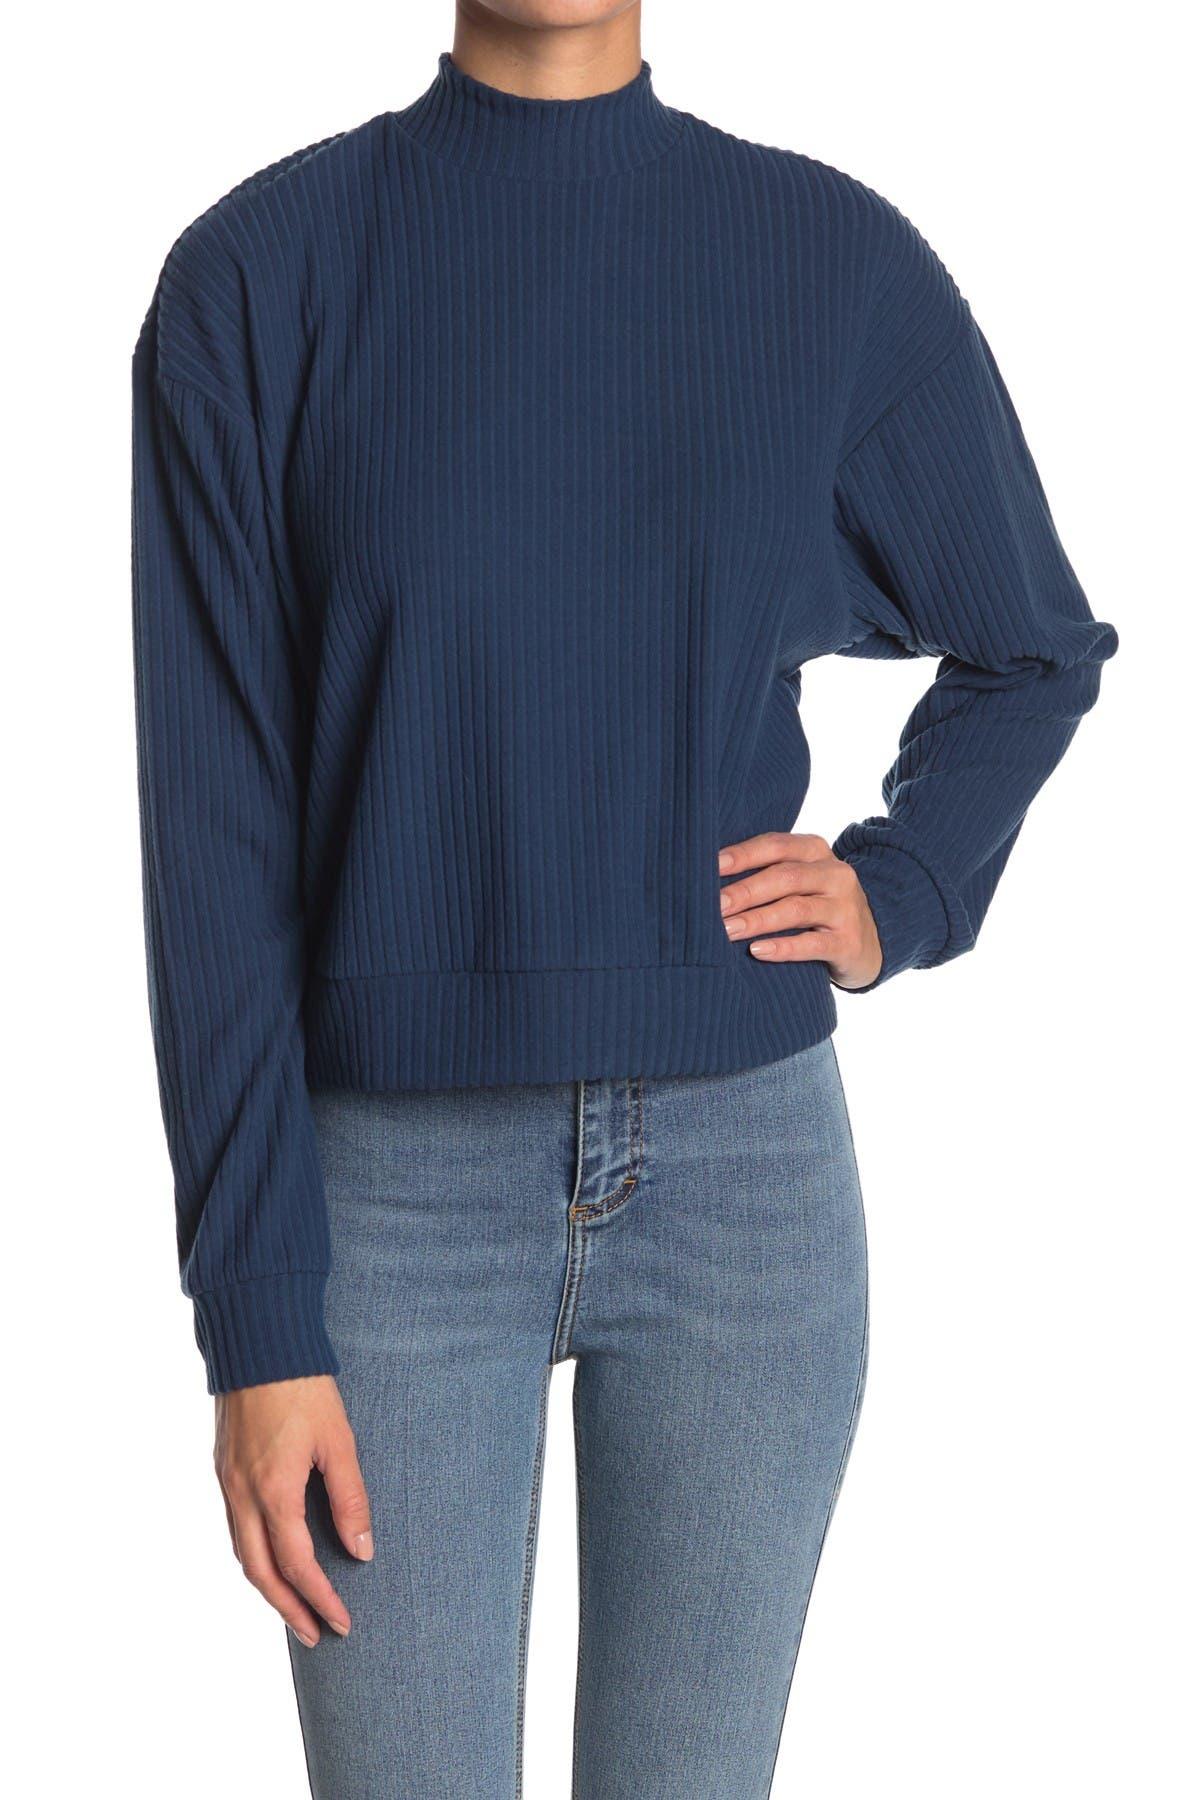 Image of Abound Brushed Ribbed Knit Mock Neck Sweater